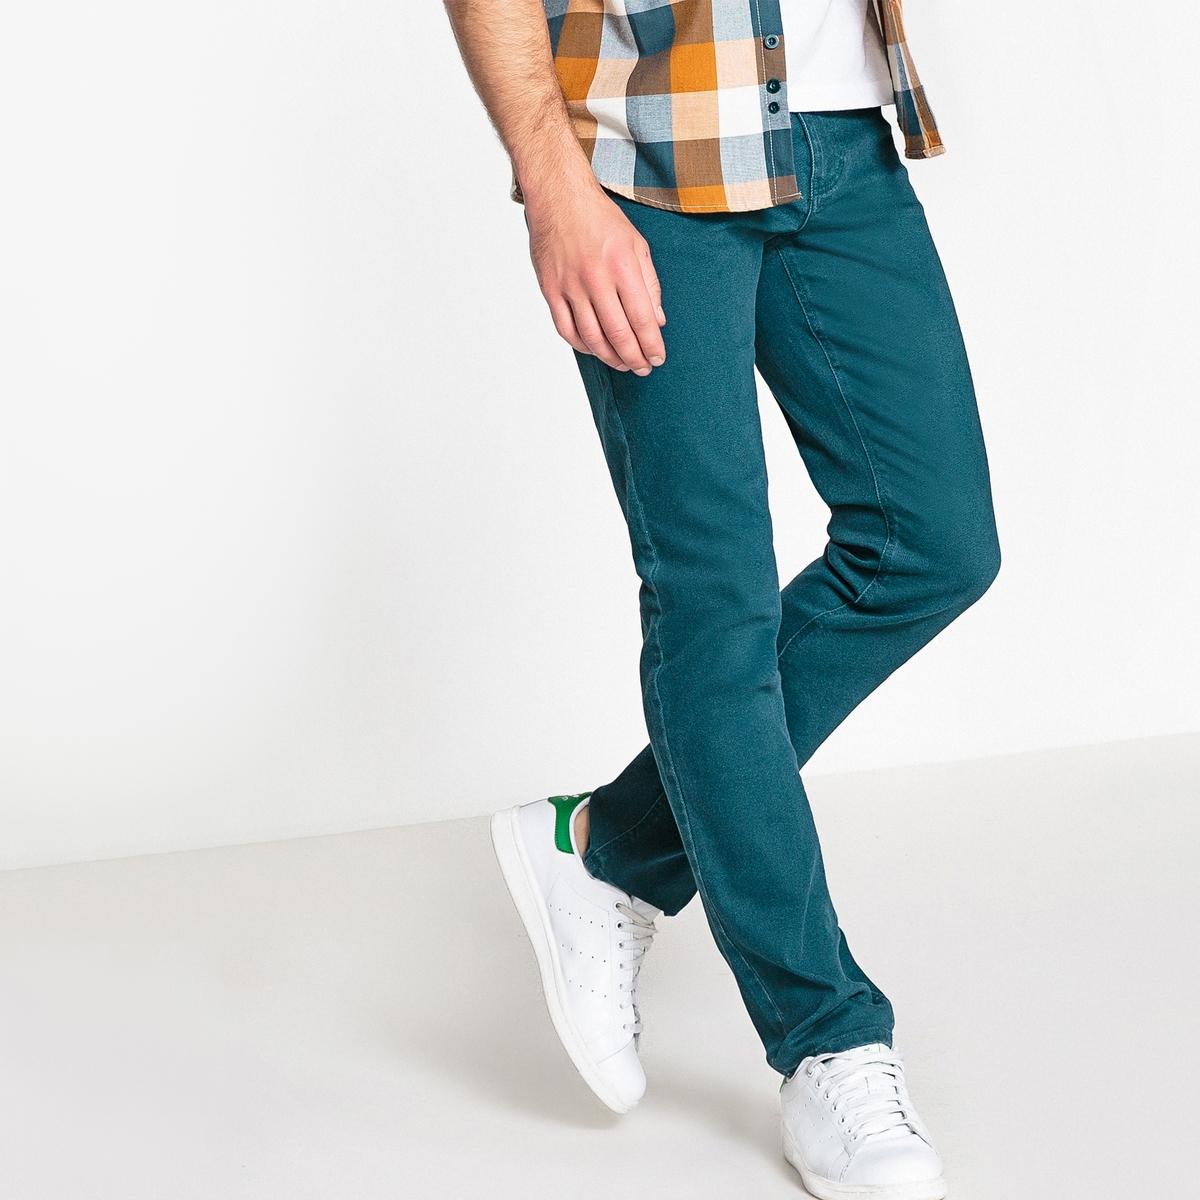 Jeans 73 cm regular, straight